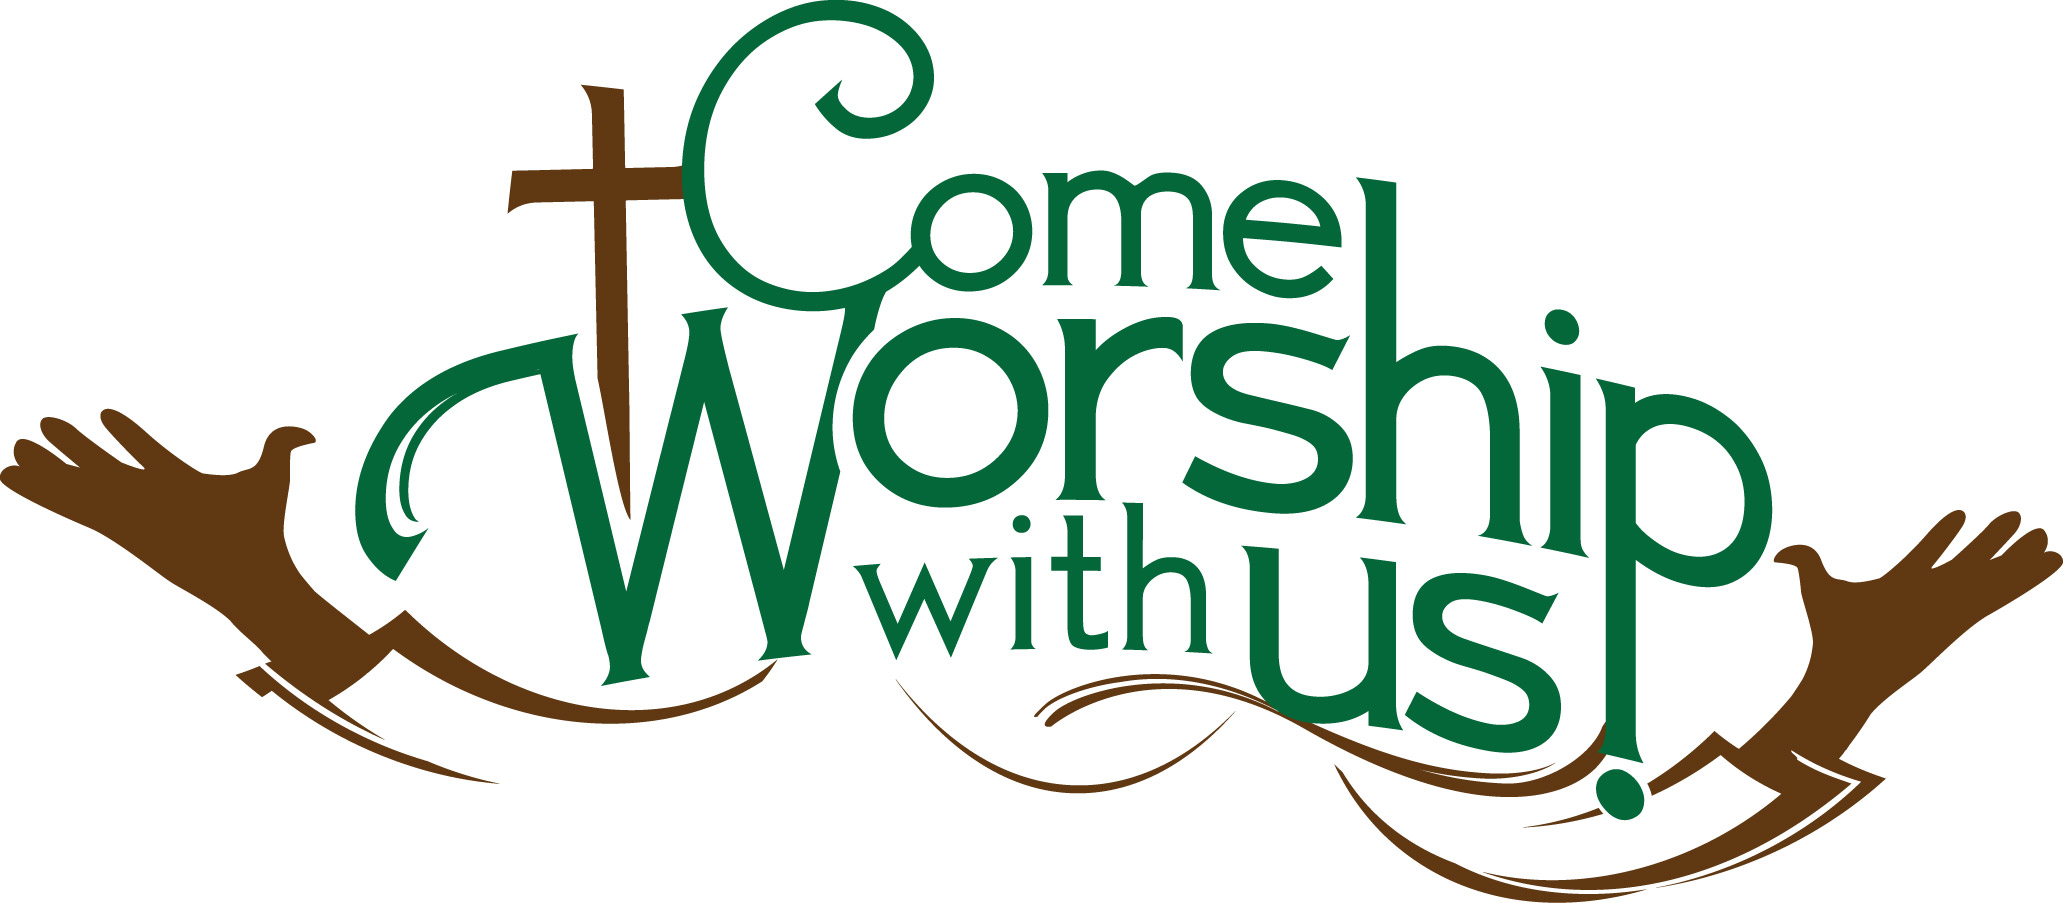 Worship Service Clipart